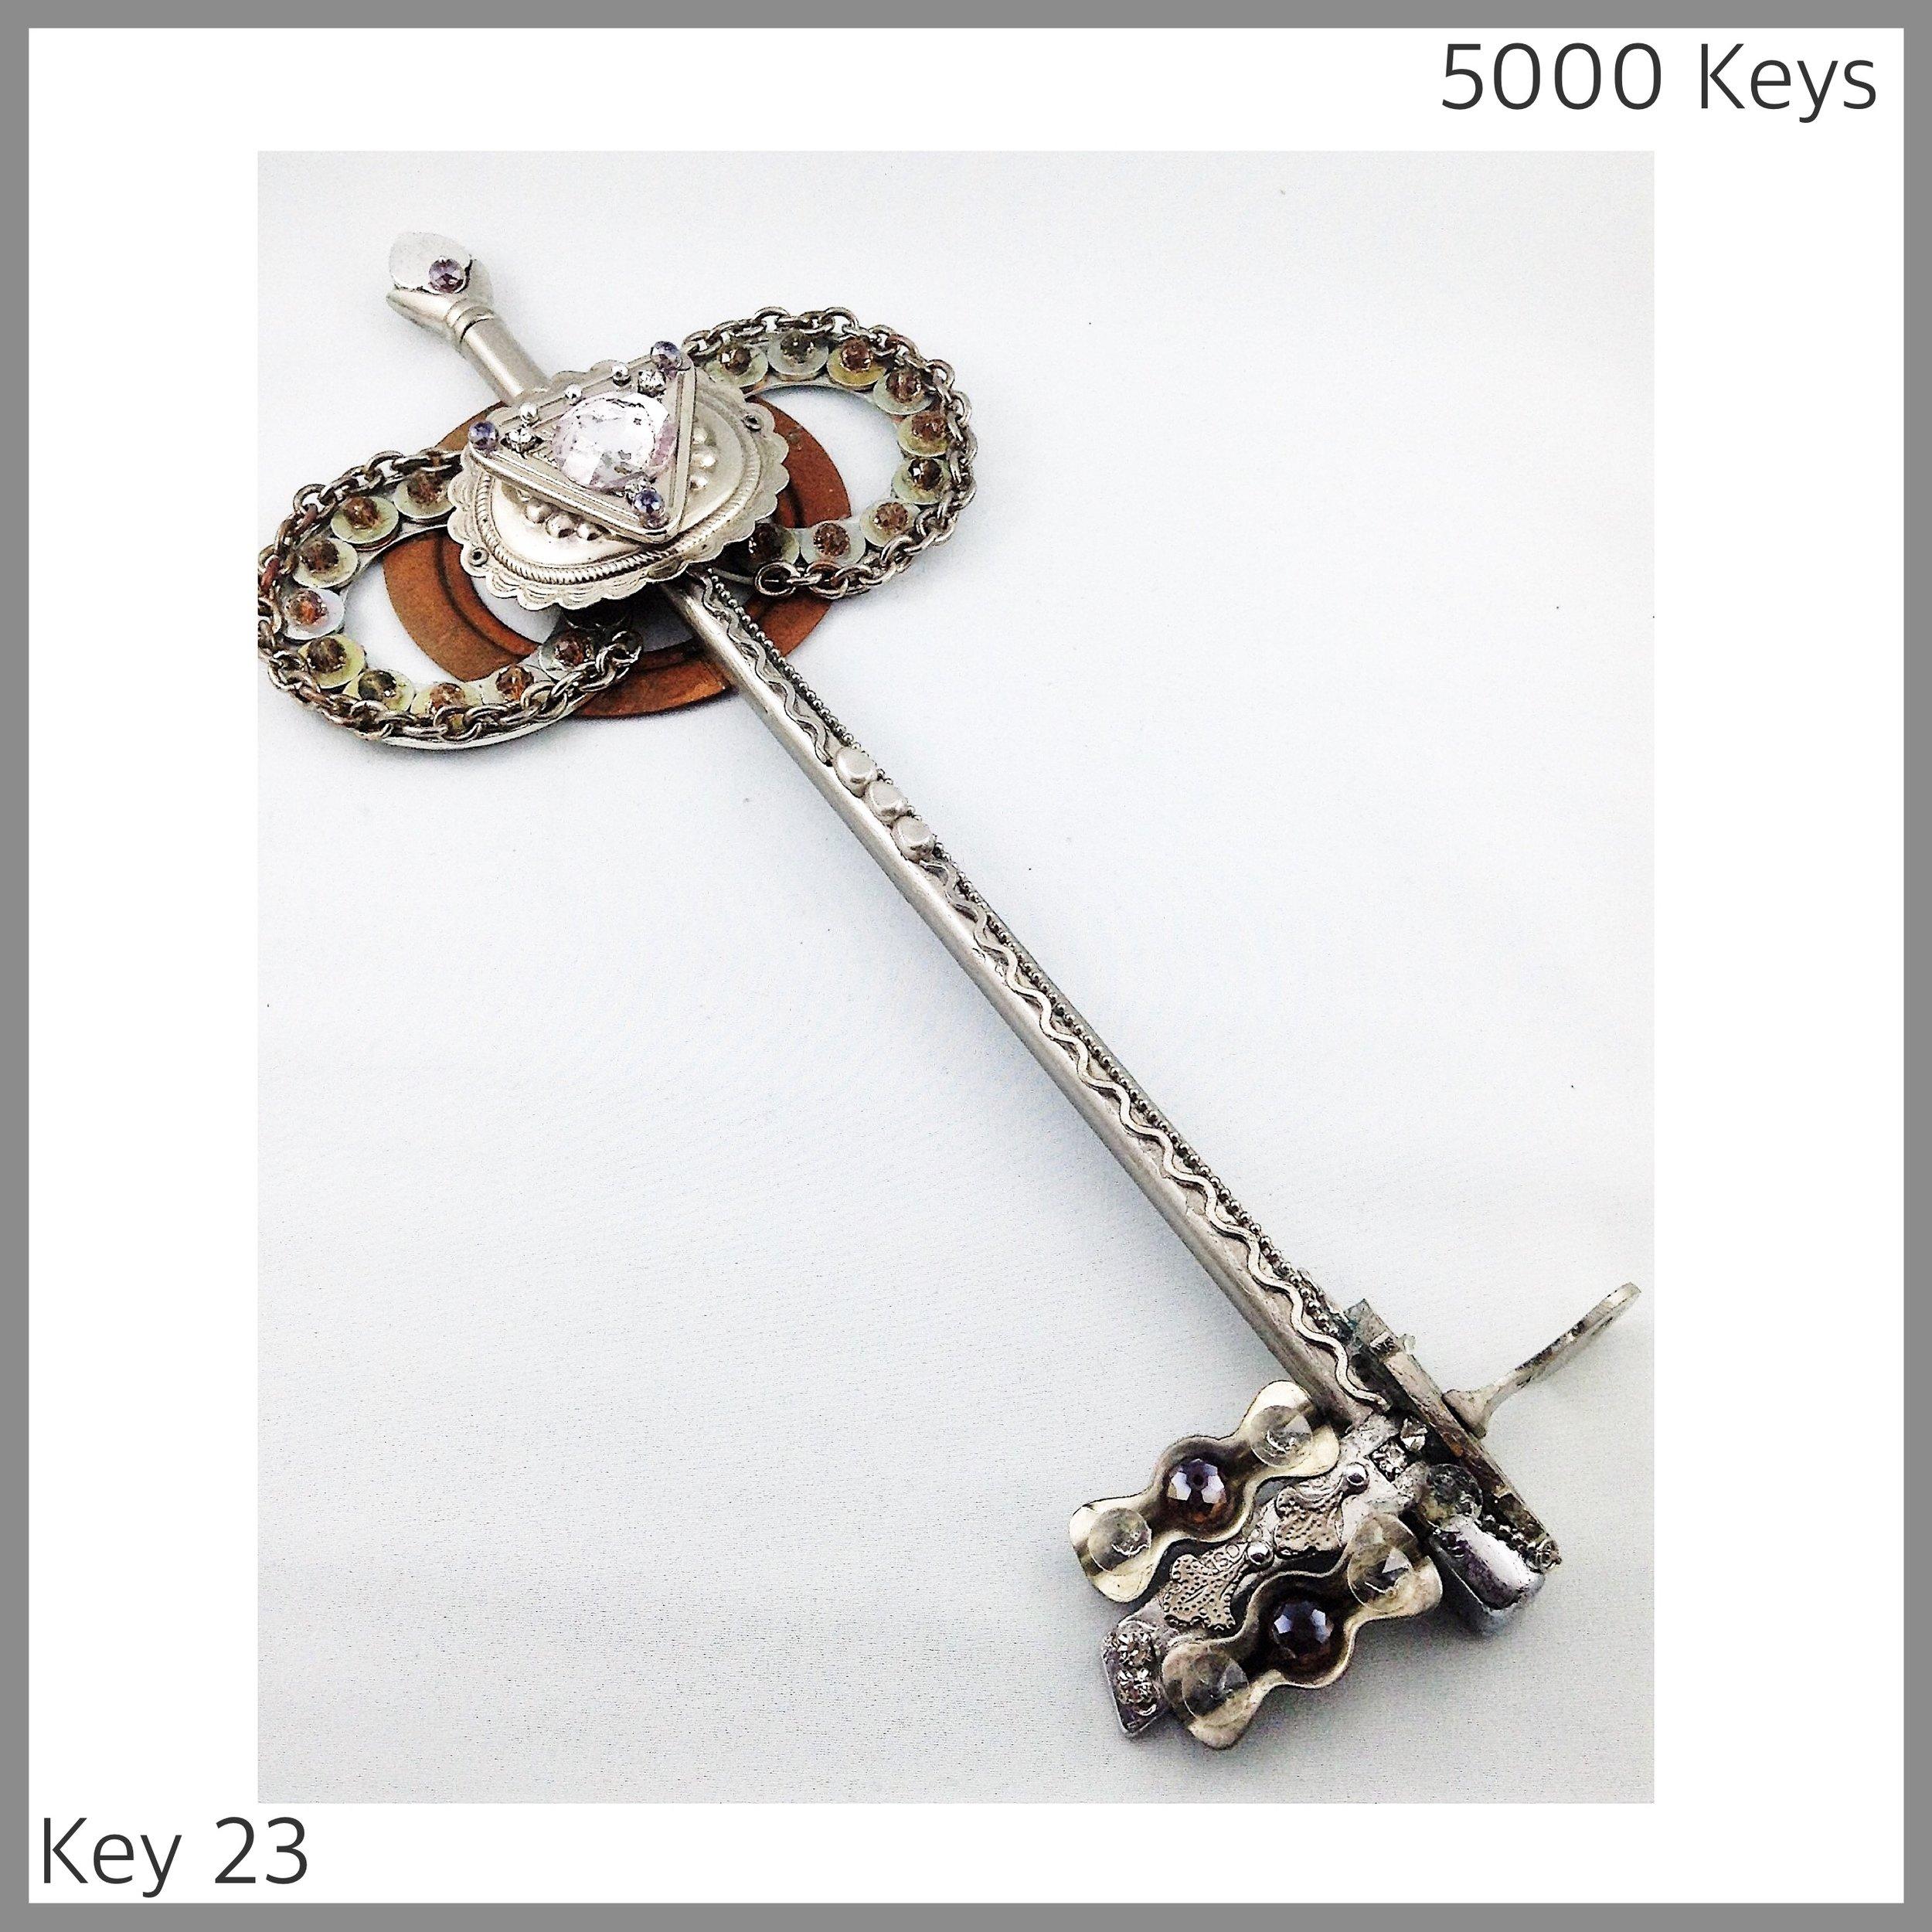 Key 23.jpg